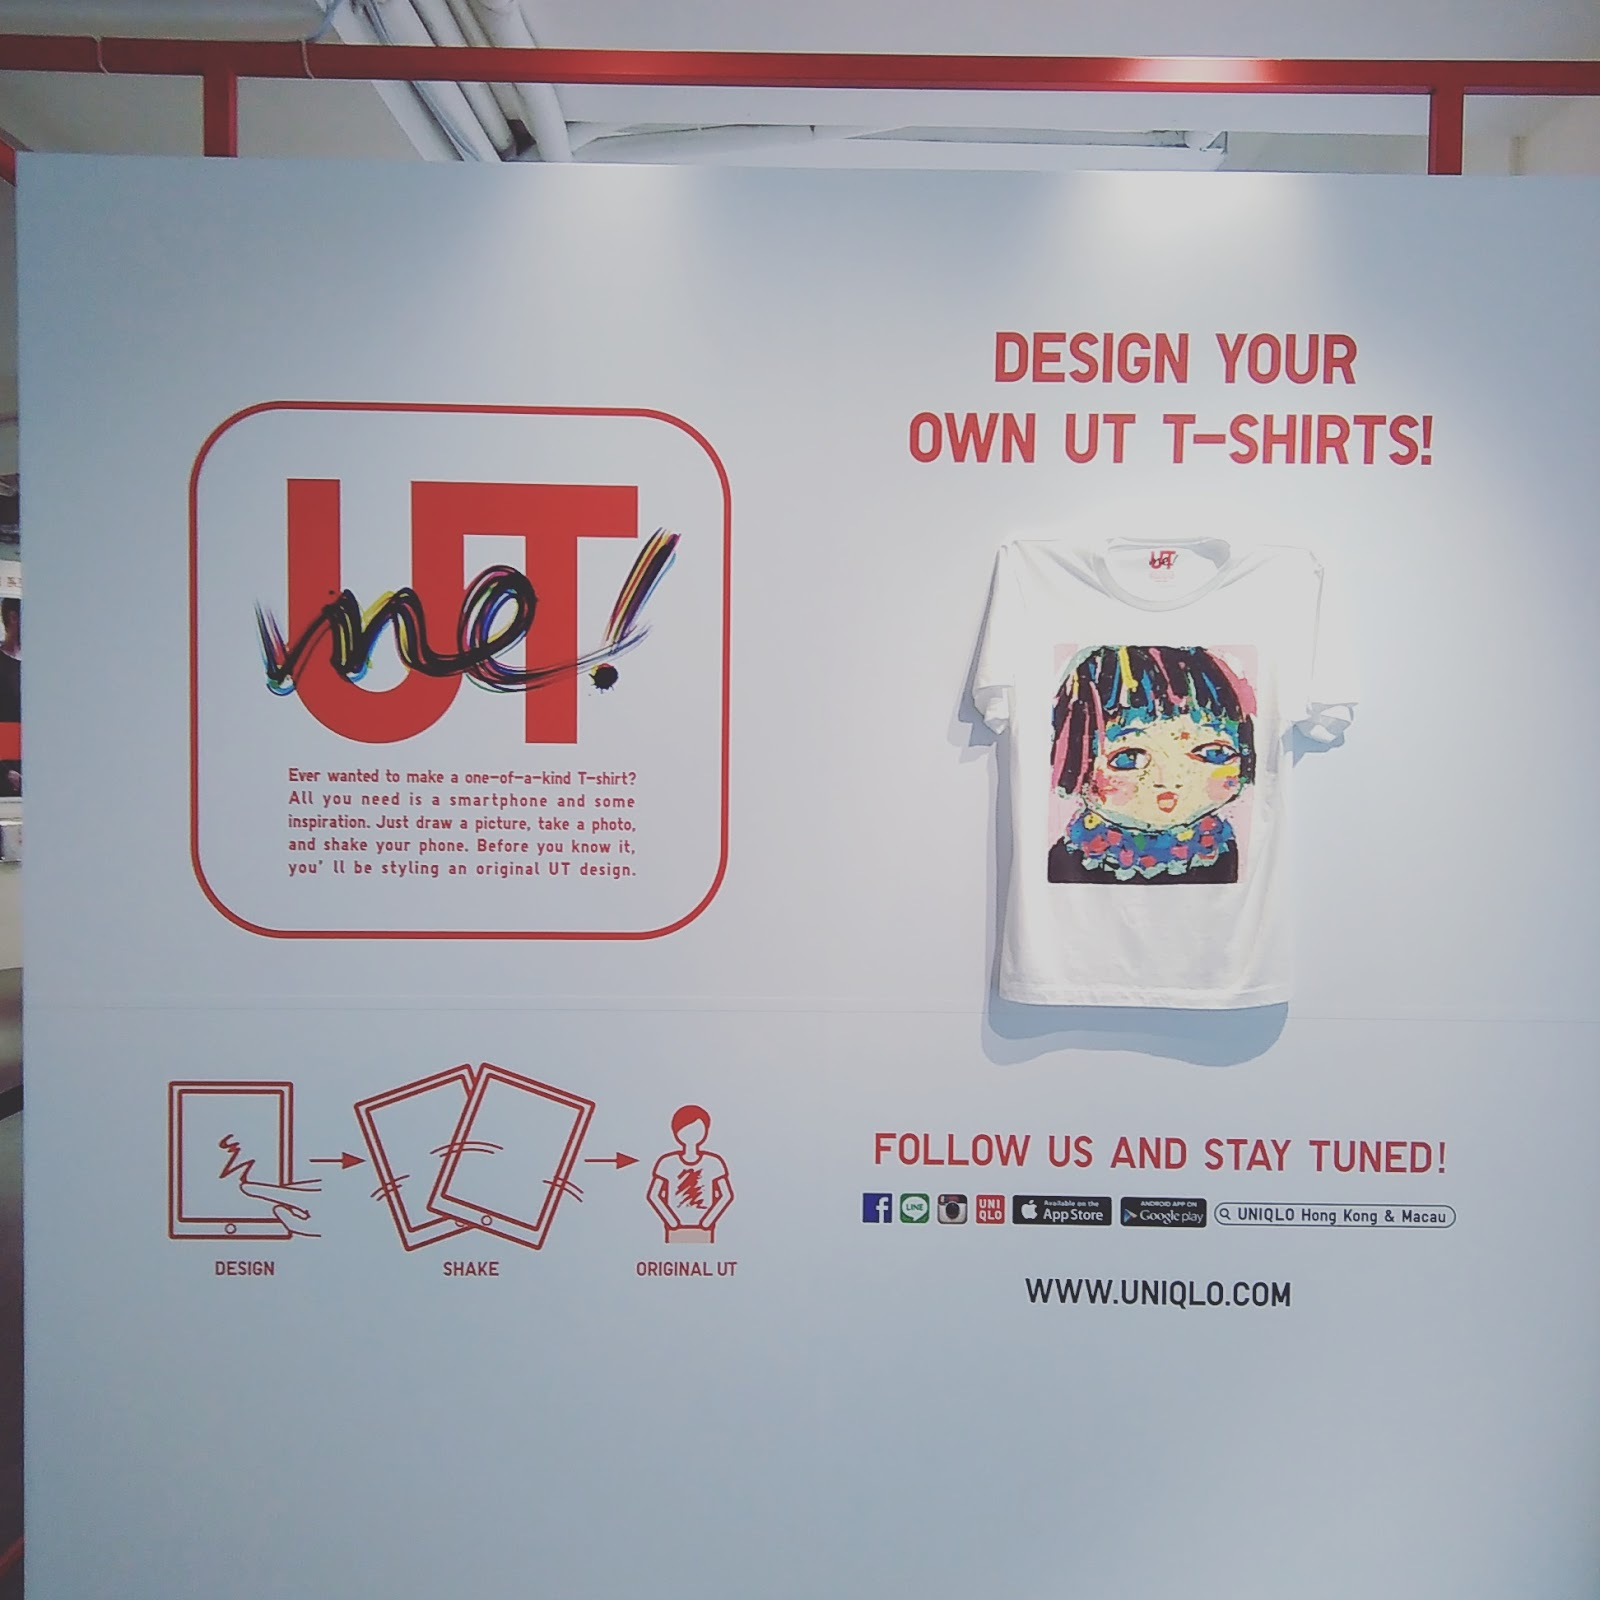 Design your own t shirt hong kong - Https Www Uniqloutme Com Hk 21st October 2015 Girlittlepeach Design Your Own Tee Diy Hong Kong